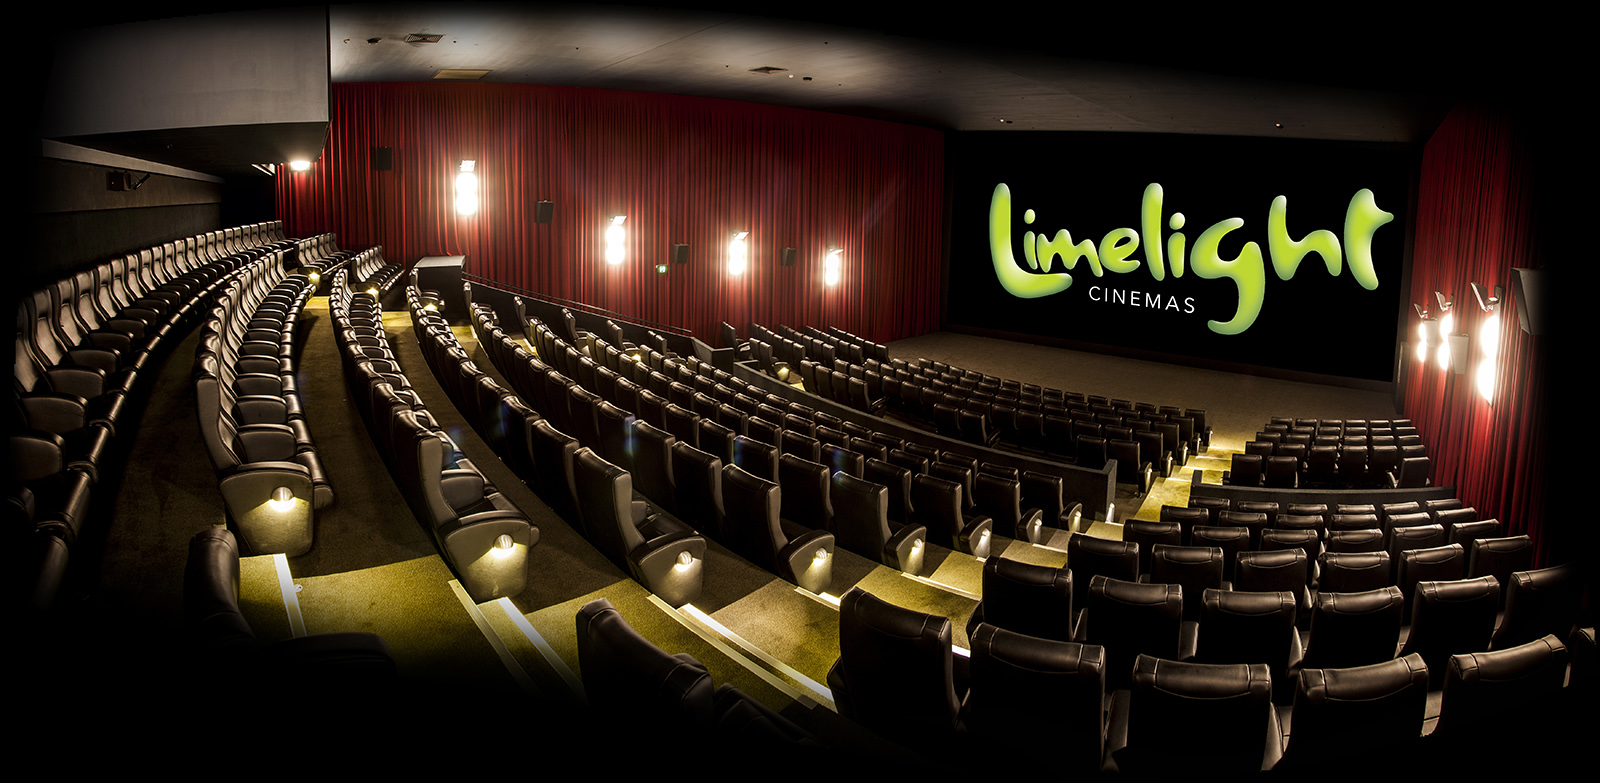 Limelight Cinemas Australia Vista Entertainment Cinema Ticketing  -> Fotos De Cinemas